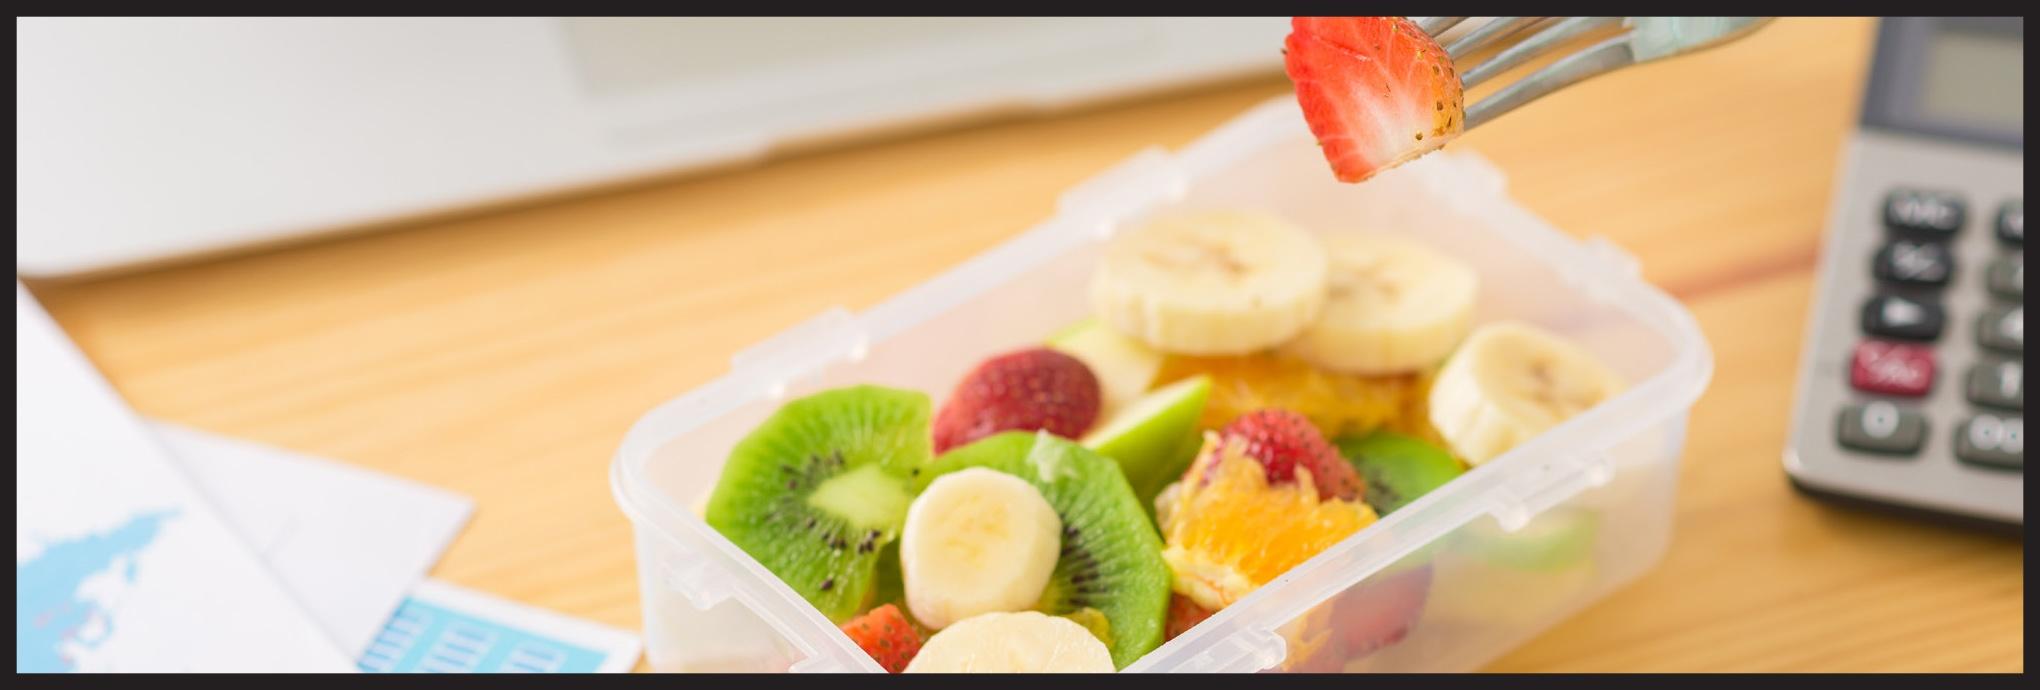 WMI_Search_HealthySnacks.jpg